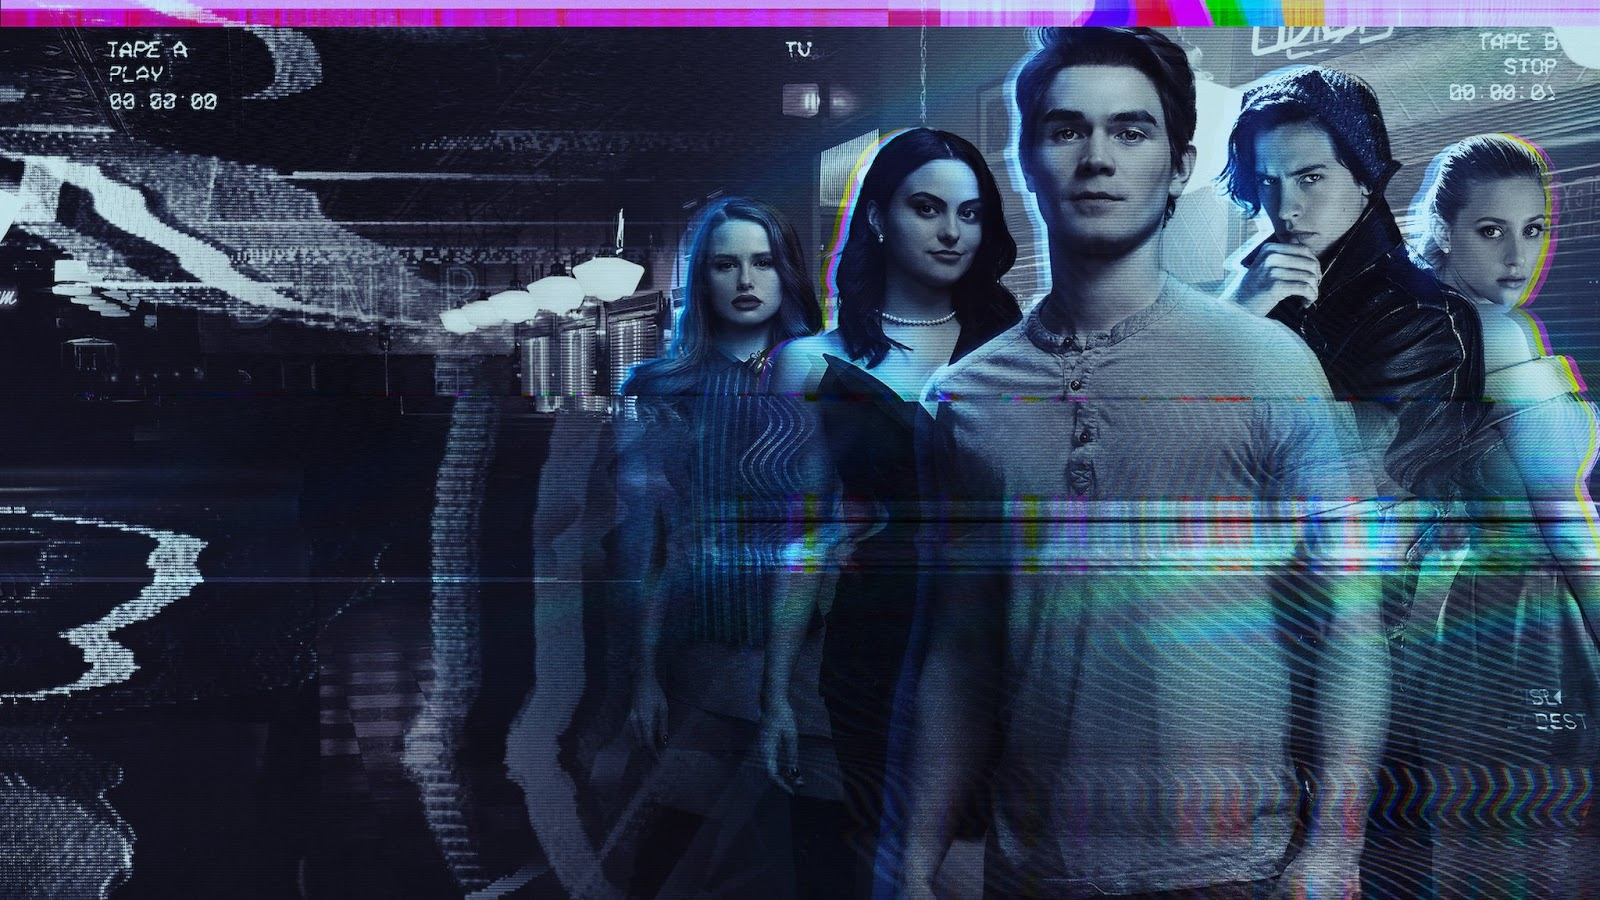 RIVERDALE SEASON 1 (2017) FULL MOVIE REVIEW